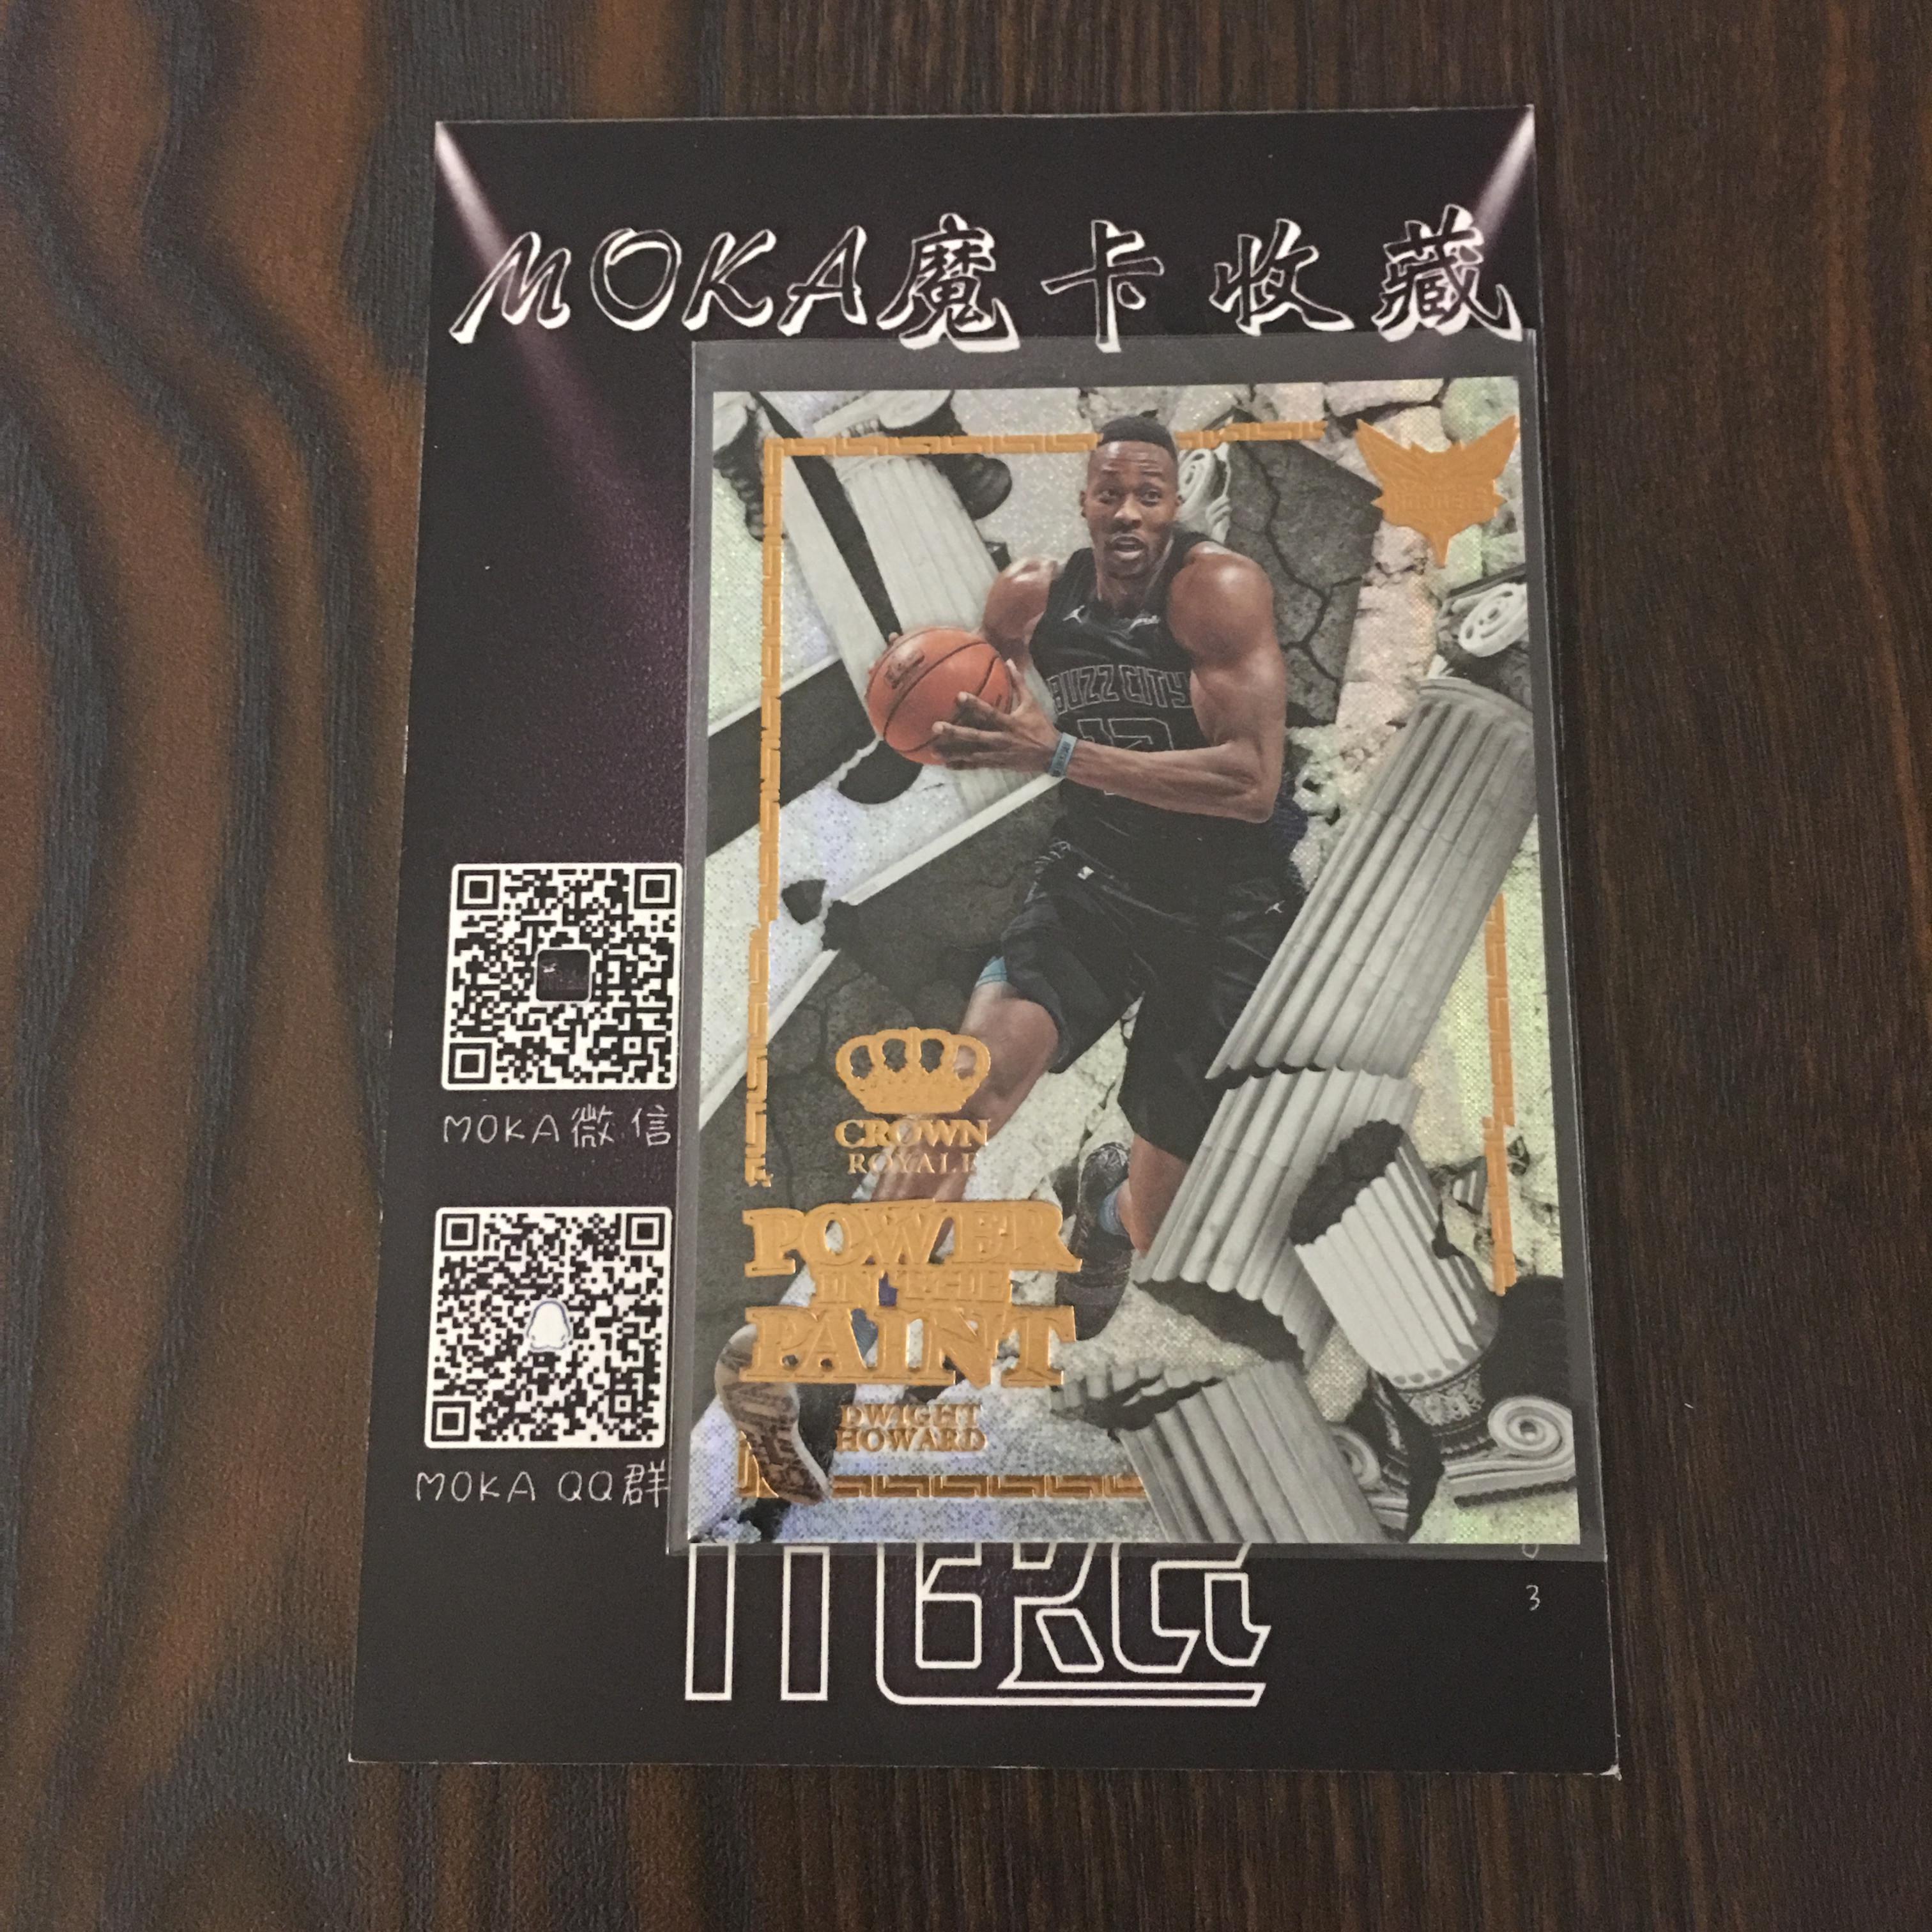 【MOKA球星卡收藏】#1804480 2017-18 Panini Crown 皇冠 特卡 箱货 黄蜂 霍华德 魔兽 凑套必备